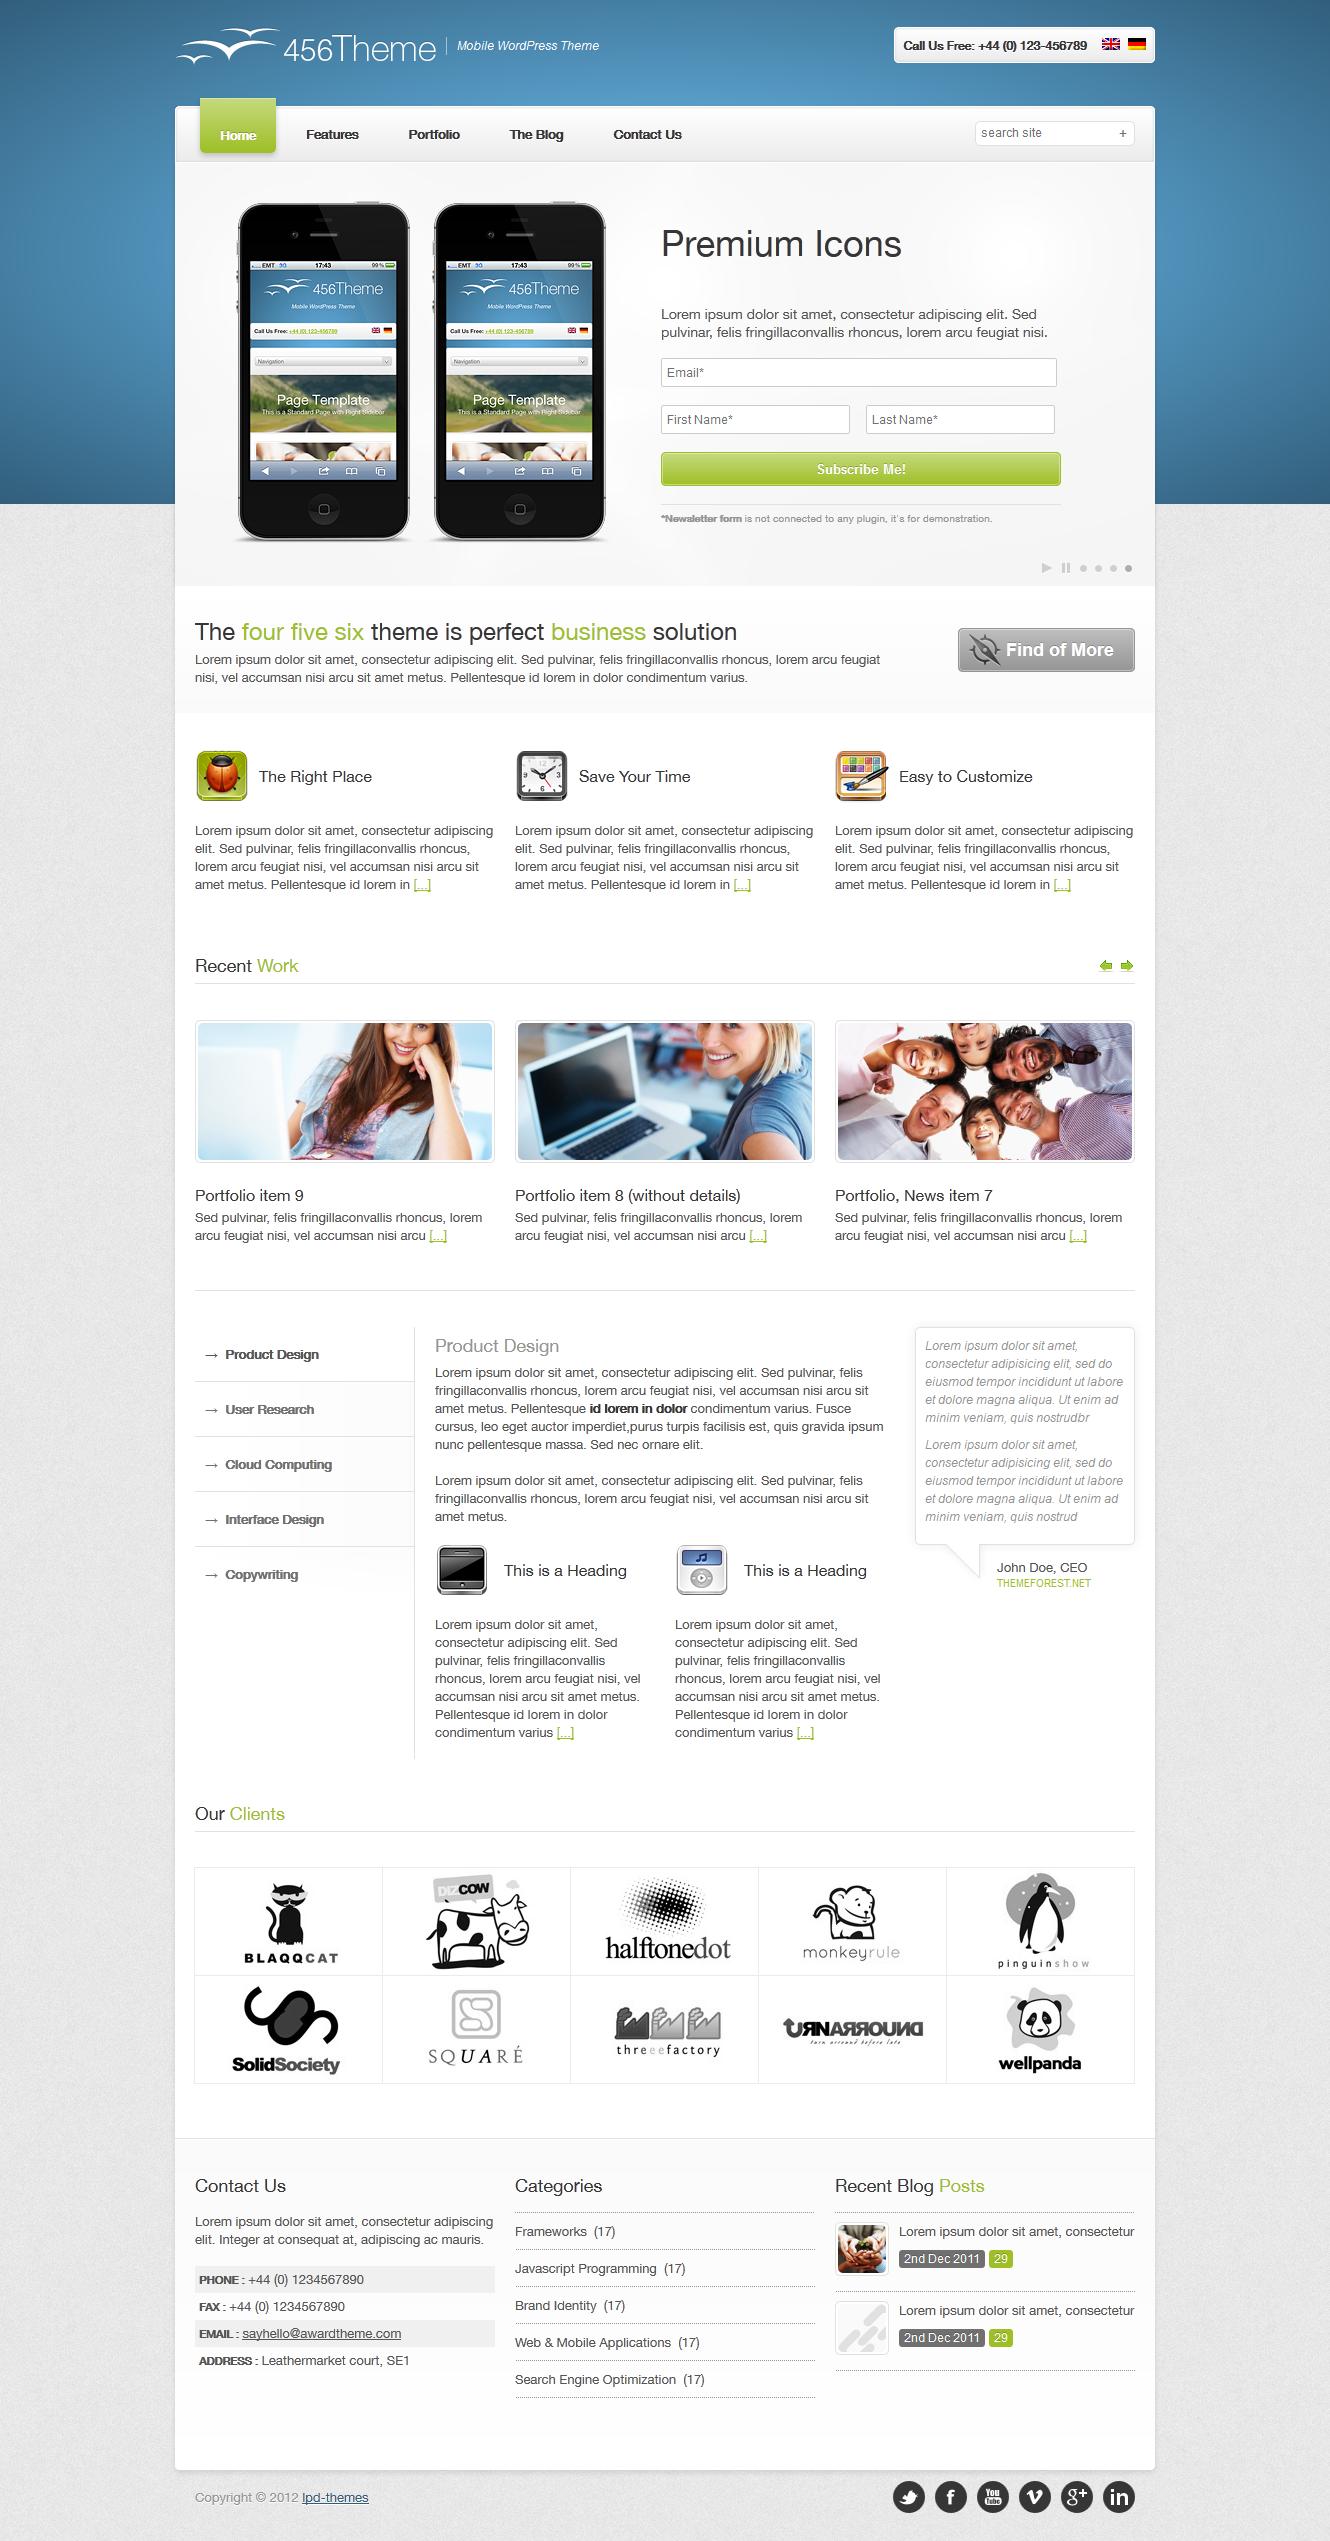 456Theme Premium Responsive Wordpress Theme - front page 2